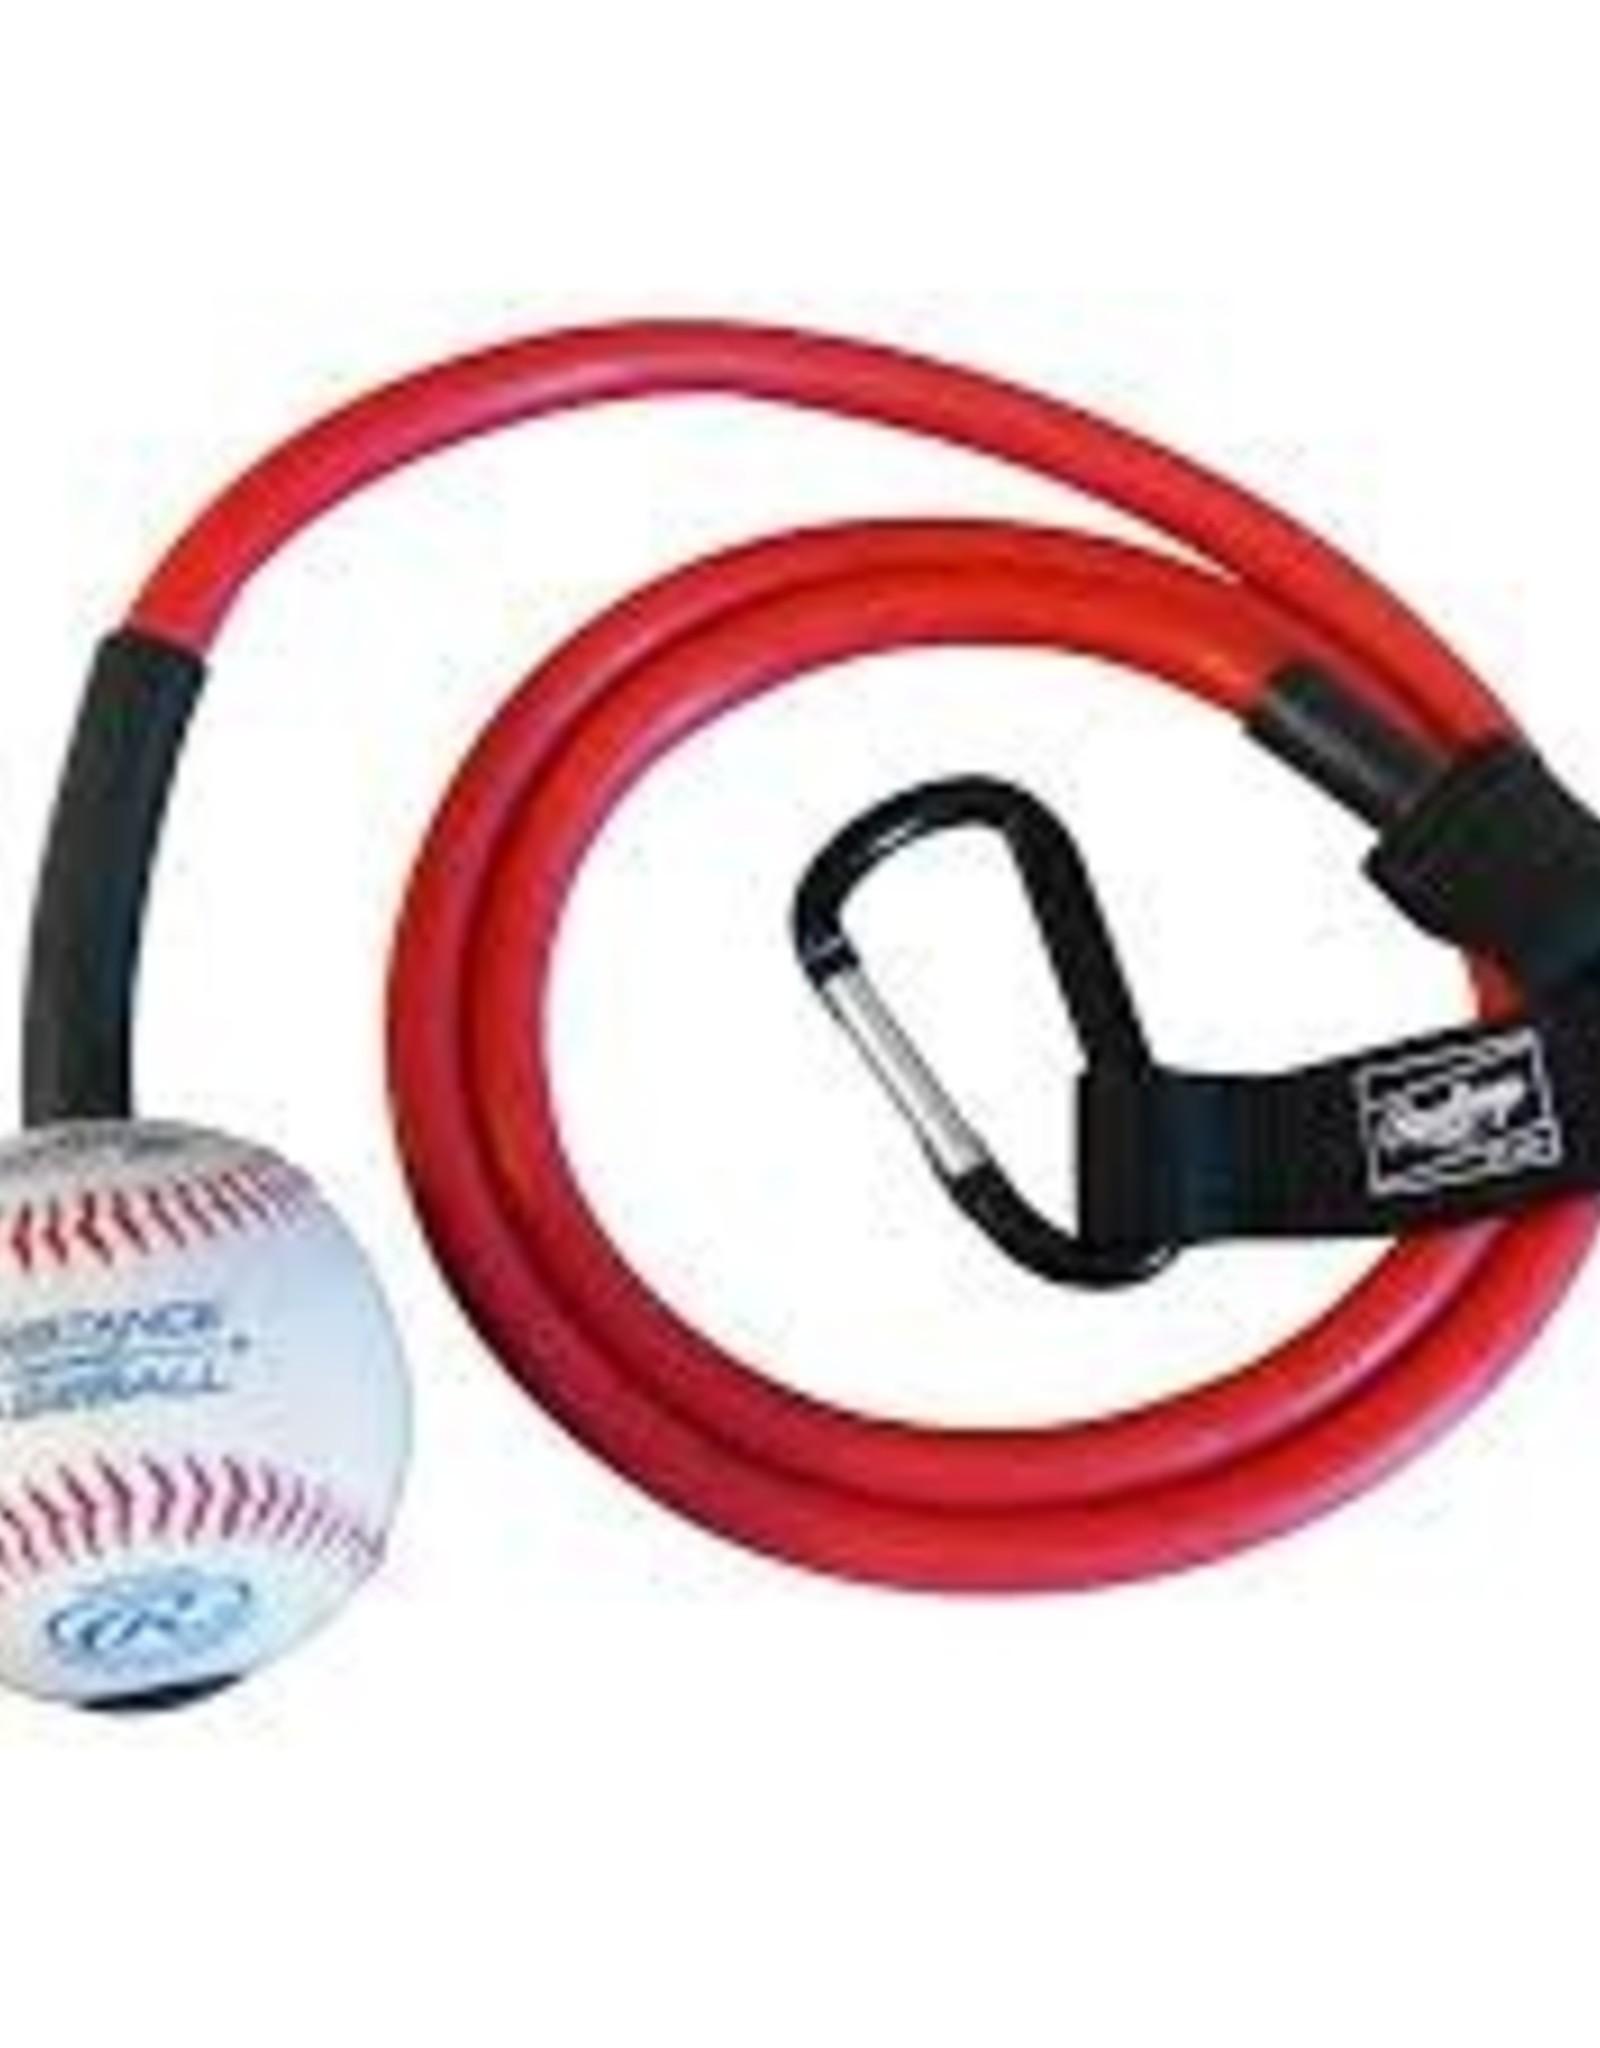 Rawlings Balle résistance élastique baseball